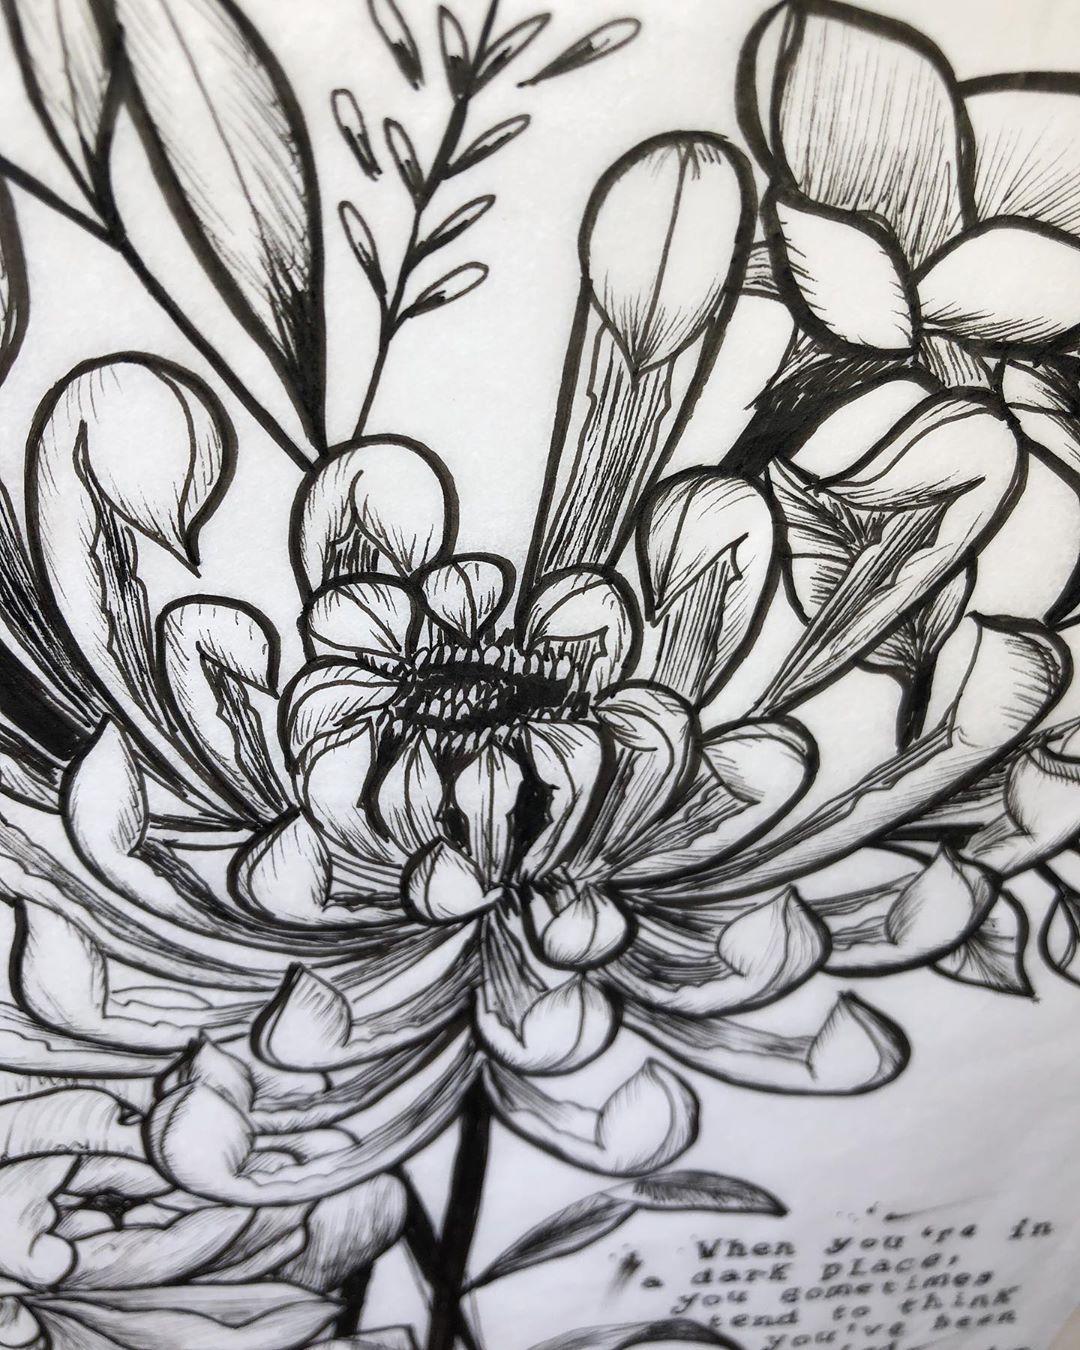 𝙿𝚎𝚛𝚑𝚊𝚙𝚜 𝚢𝚘𝚞'𝚟𝚎 𝚋𝚎𝚎𝚗 𝚙𝚕𝚊𝚗𝚝𝚎𝚍?? 🌻  #art #drawing #flowerdrawing #floraldrawing #flowerart #floralart #tattooart #tattoodrawing #promarker #girly #girlytattoo #girlytattoos #wiccaart  #tattoodesign #doodle #sketch #inkideas #instaartist #femaninetattoo #ornementaltattoo #peony #peonyflower